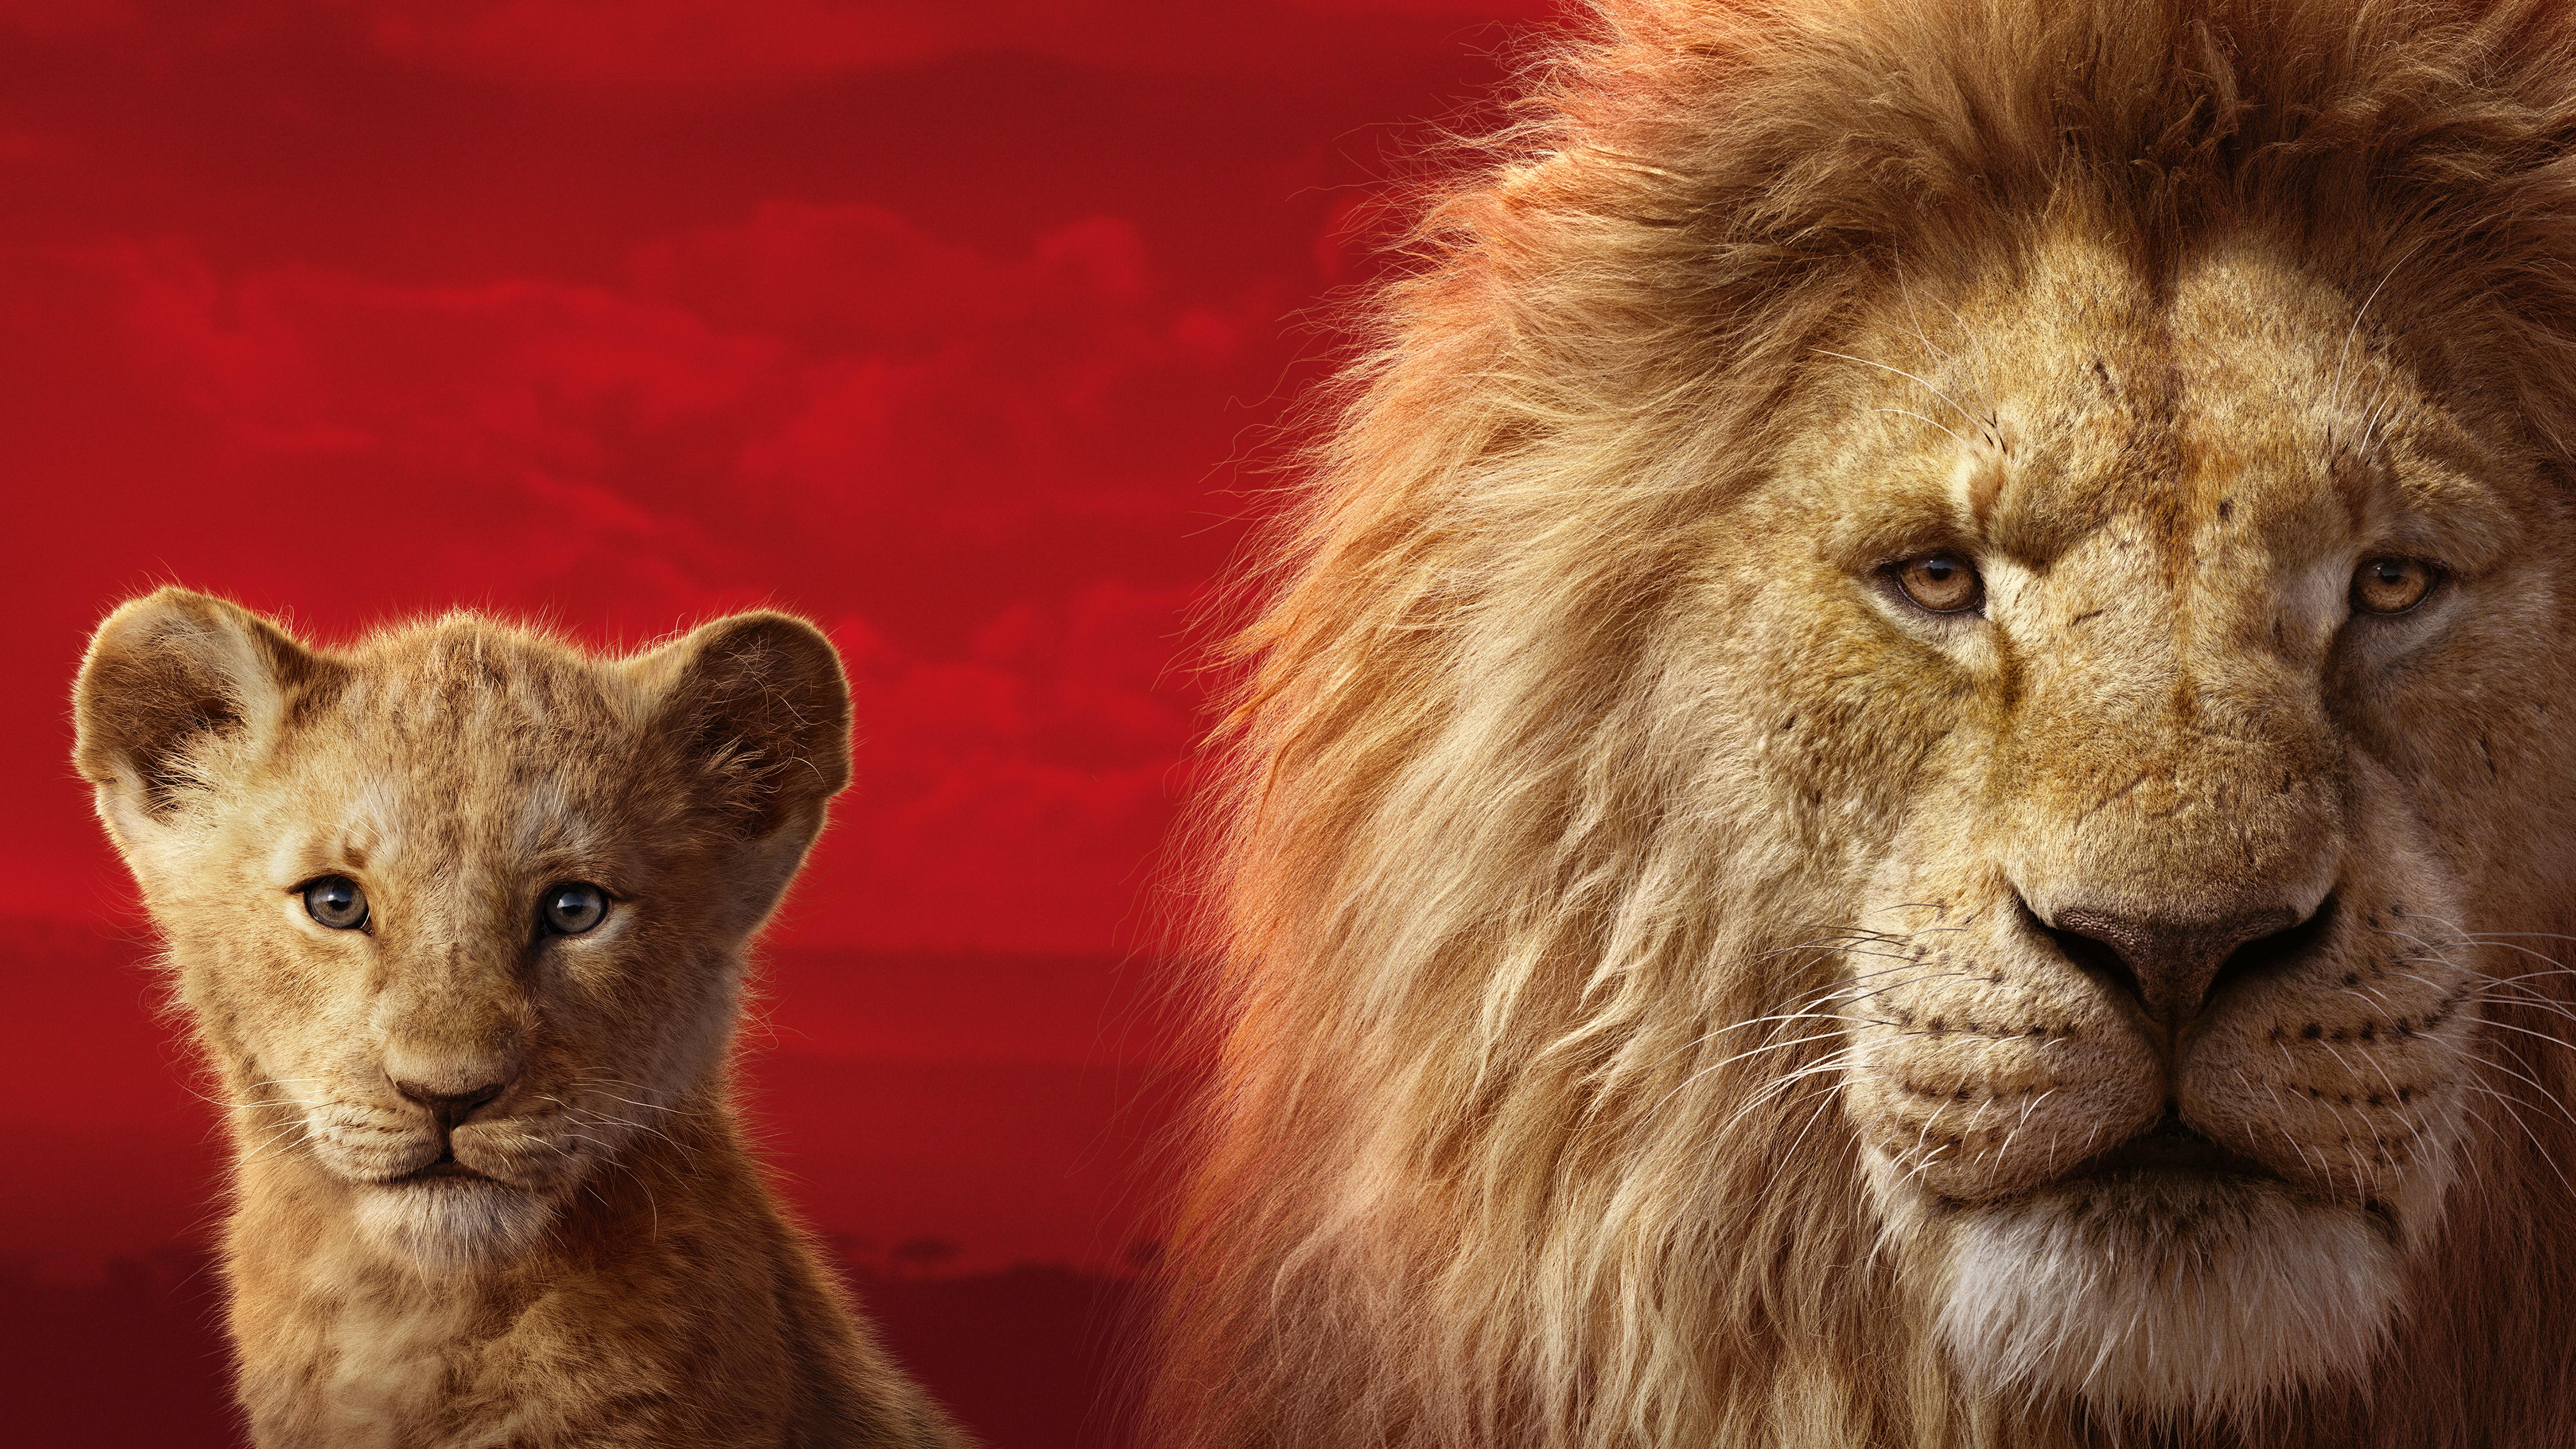 The Lion King 2019 5k Retina Ultra Hd Wallpaper